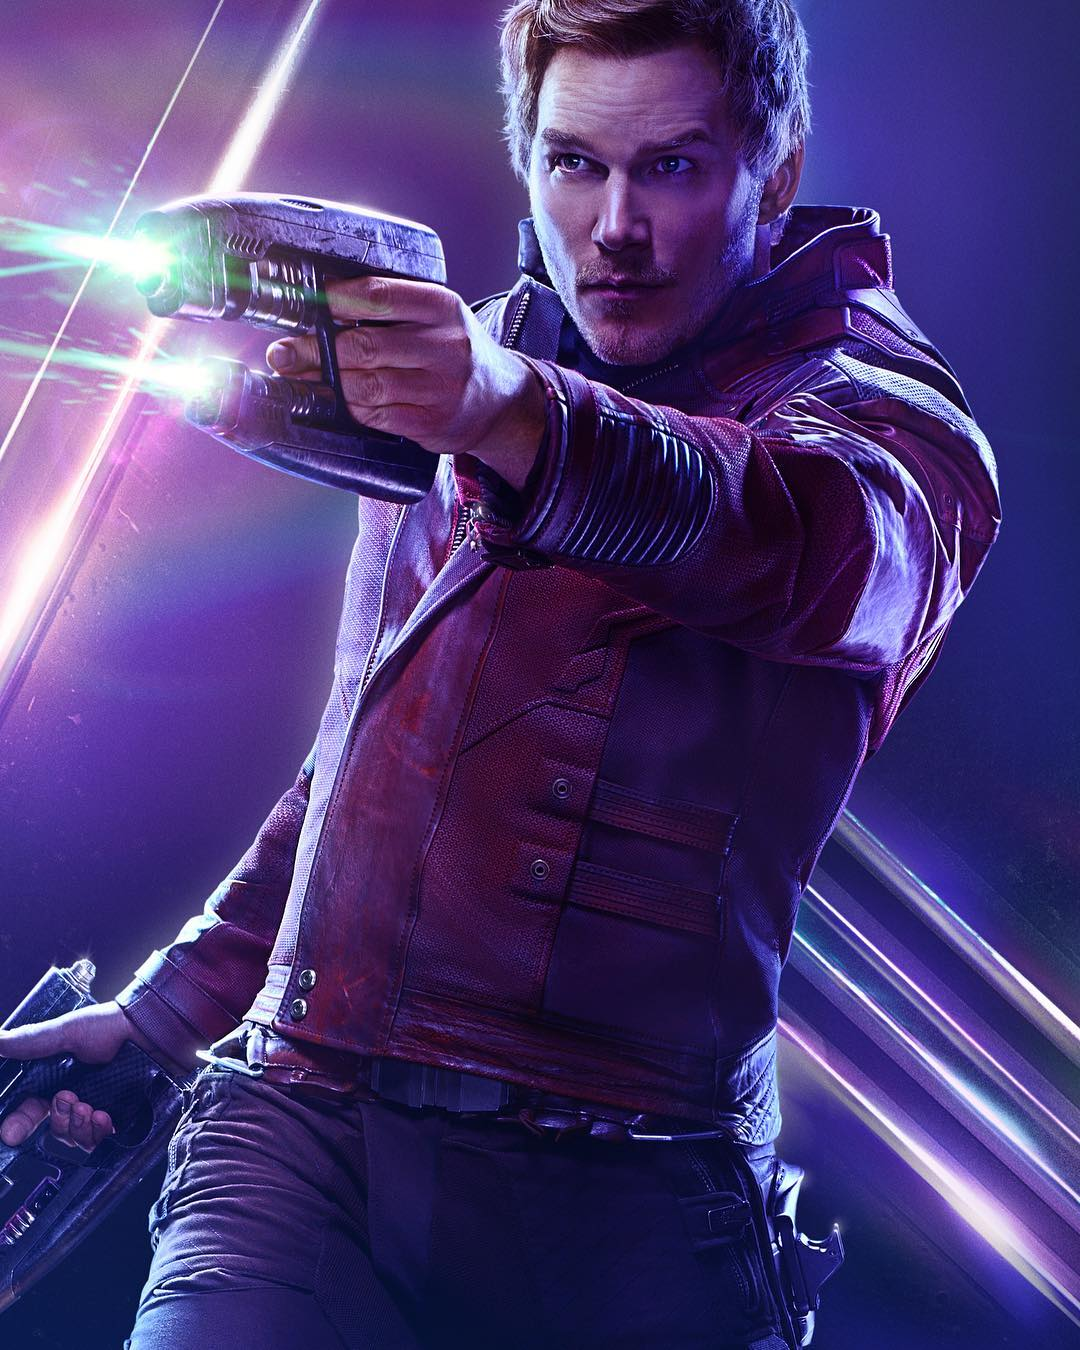 Chris Pratt 於 Marvel系列電影中飾演「星爵」